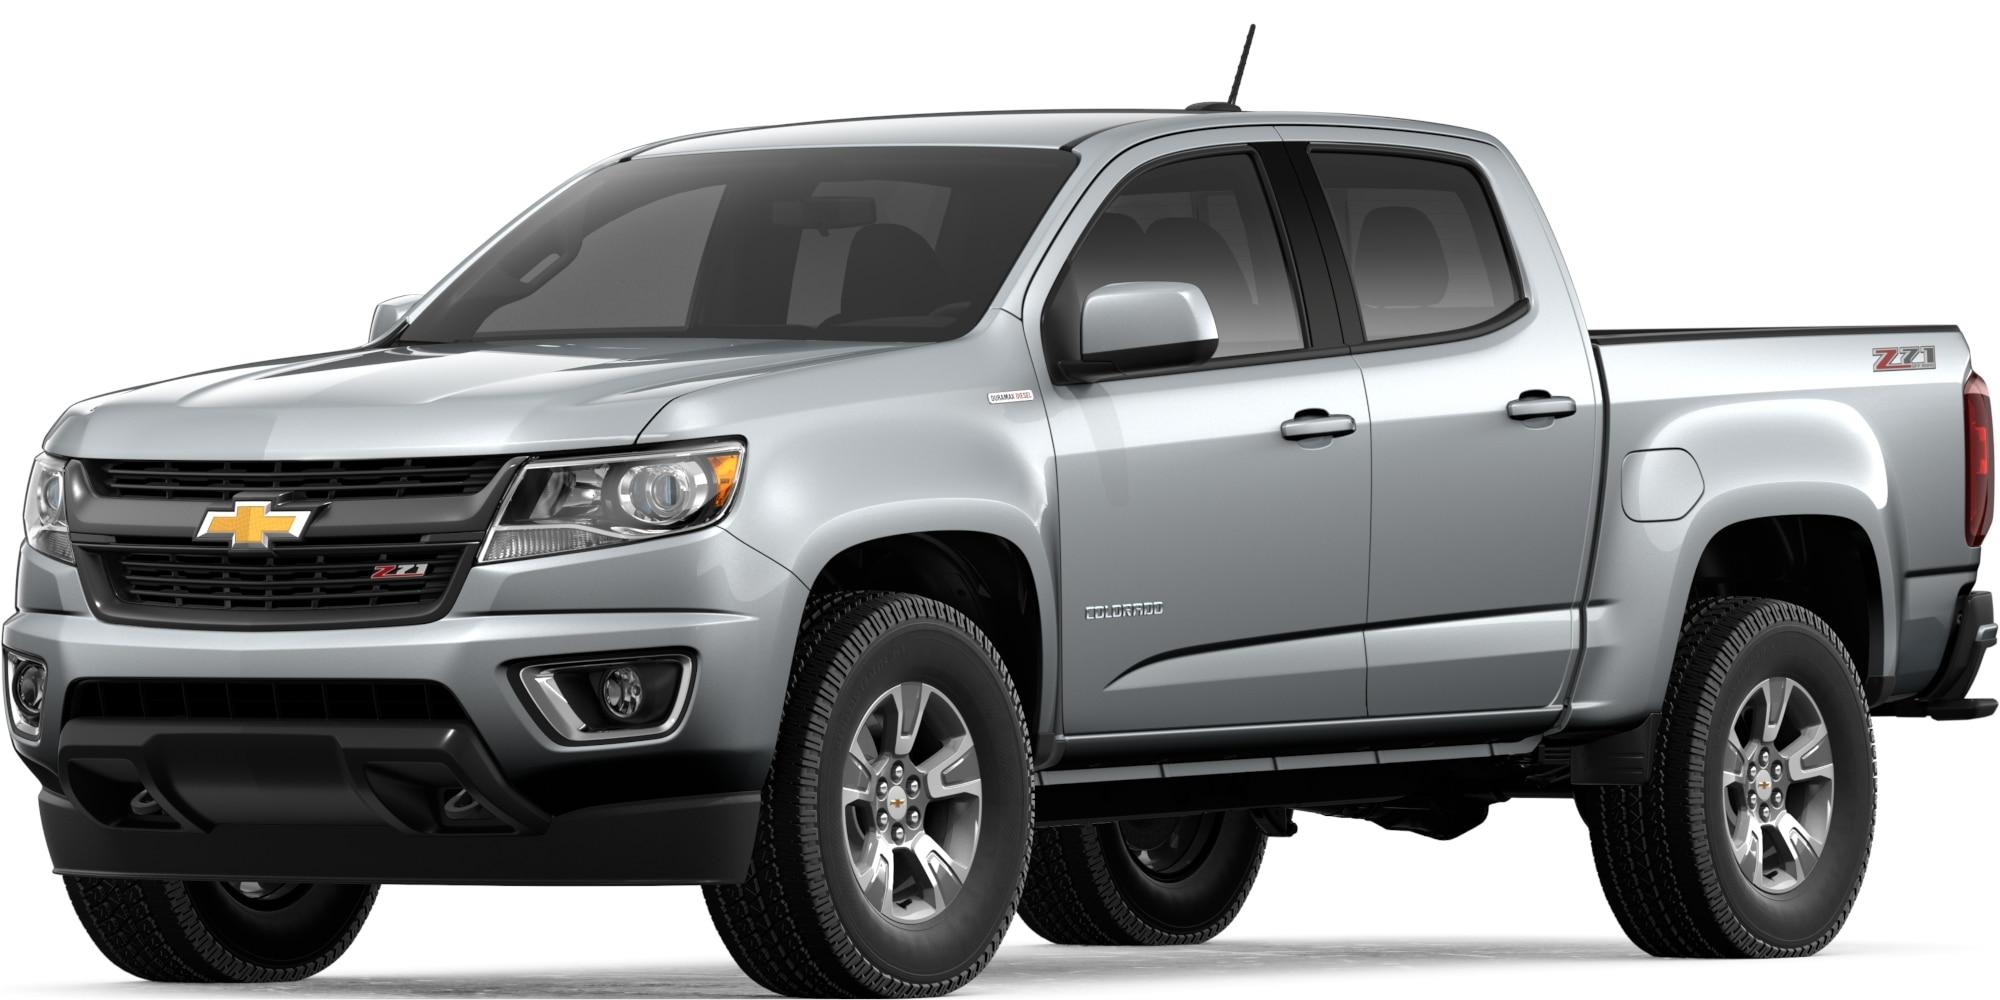 Colorado 2019: Camioneta mediana - Camioneta diésel